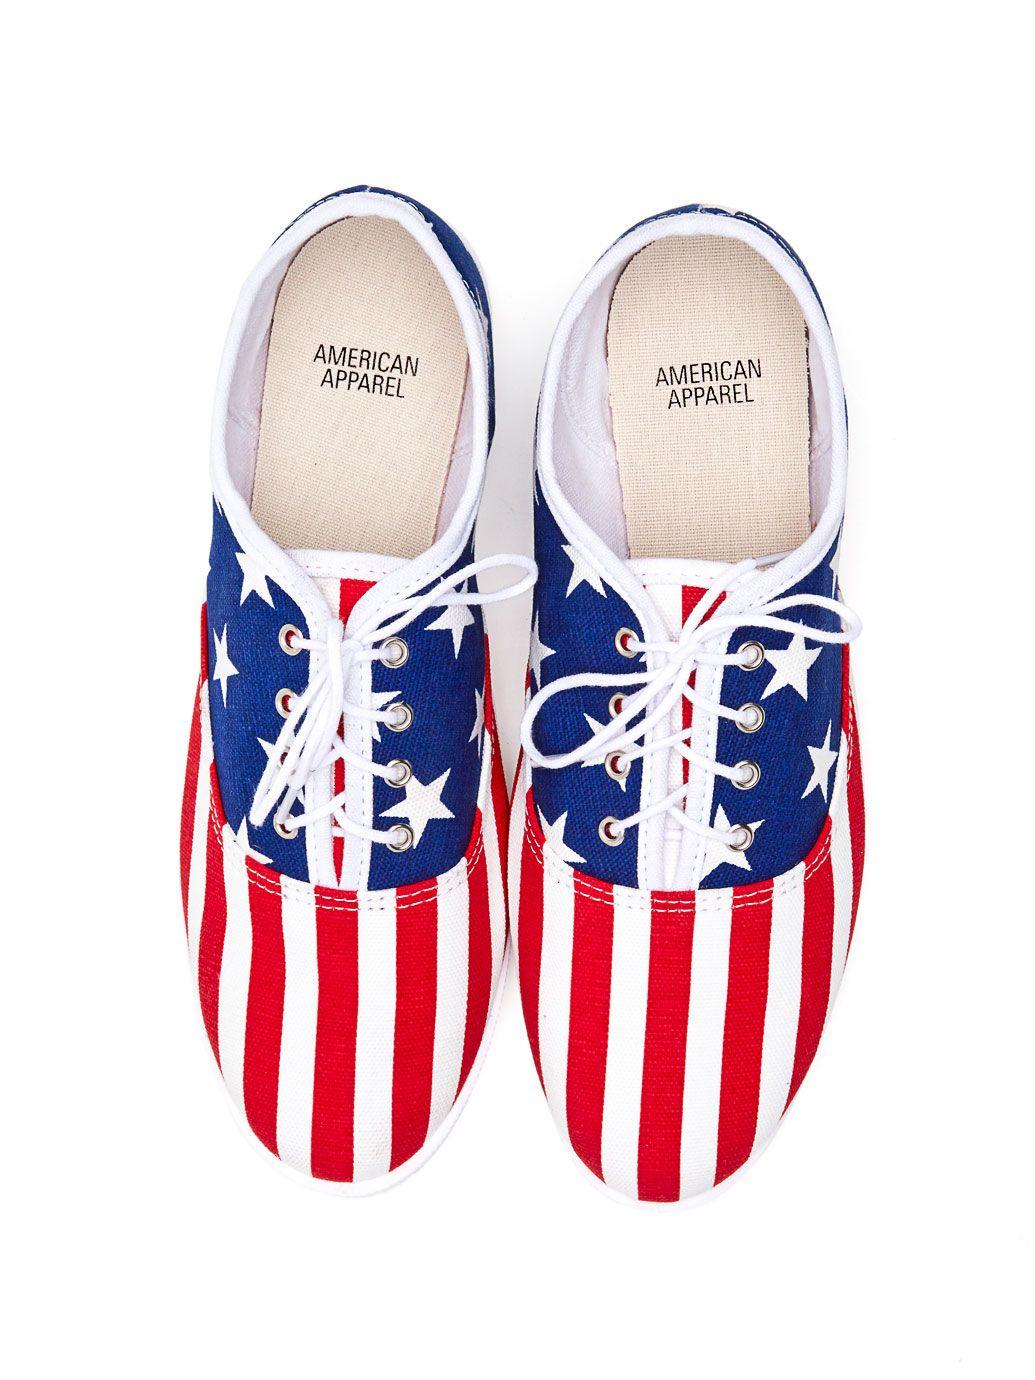 Unisex Tennis Shoe American Flag American Apparel American Flag Shoes American Apparel Shoes Tennis Shoes